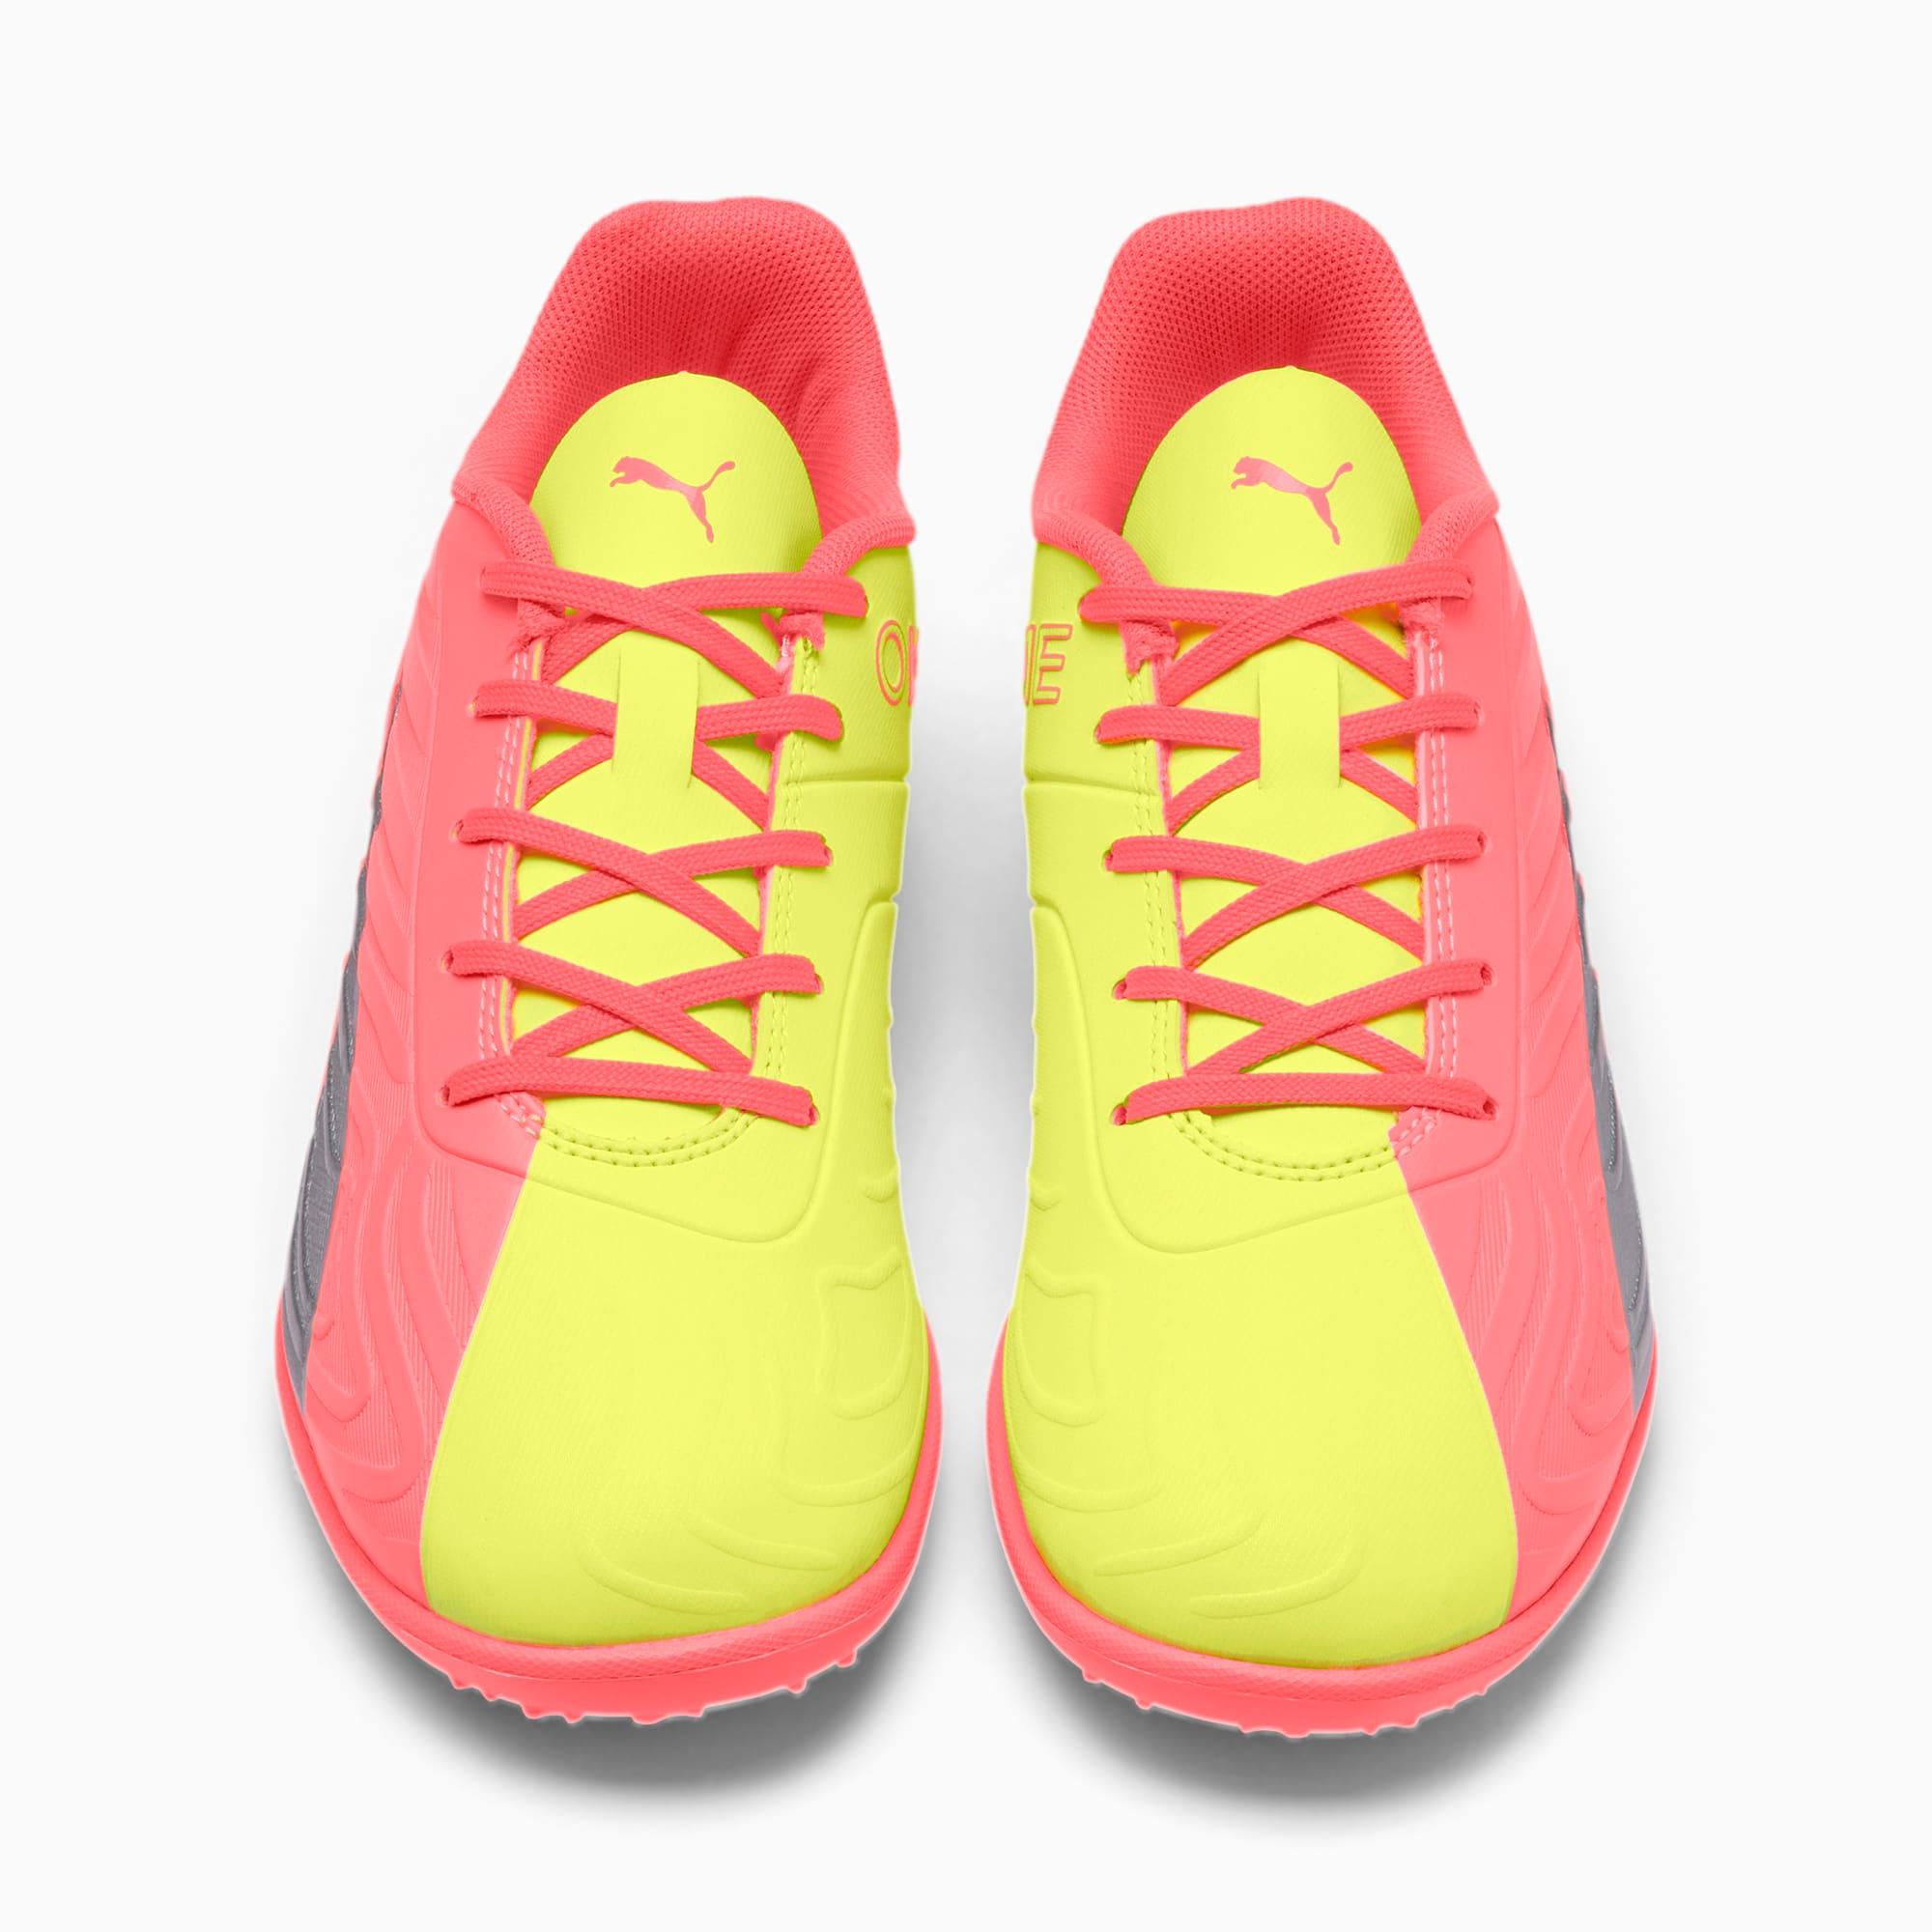 PUMA ONE 20.4 OSG TT Soccer Shoes JR